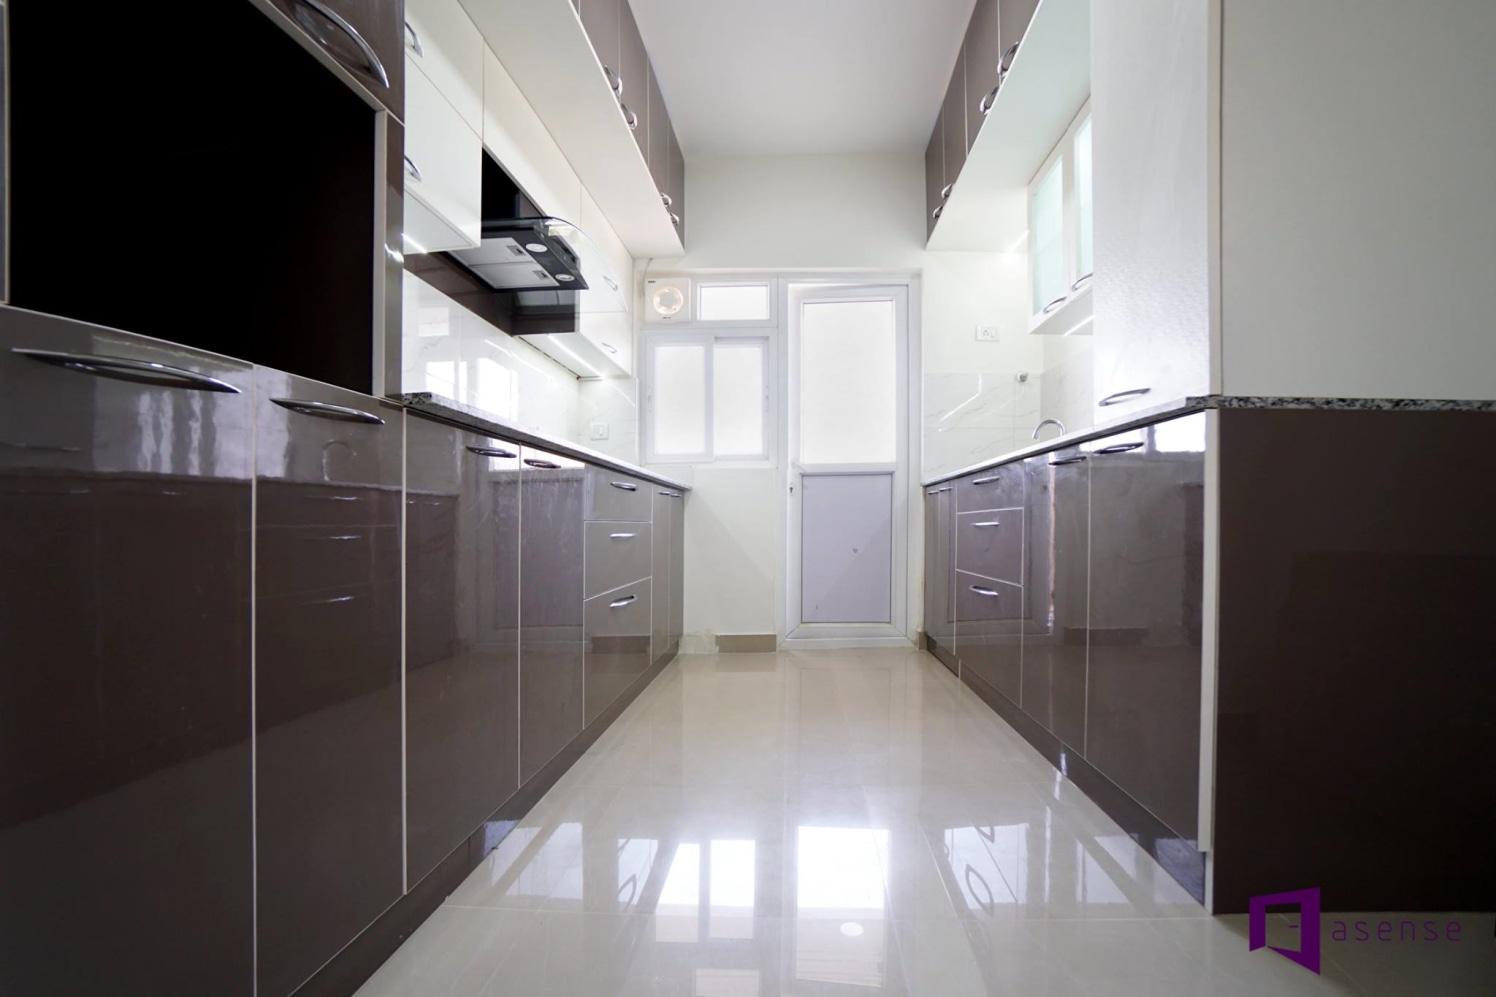 Black and White Themed Parallel Kitchen by Snigdha Ghosh Modular-kitchen Contemporary | Interior Design Photos & Ideas